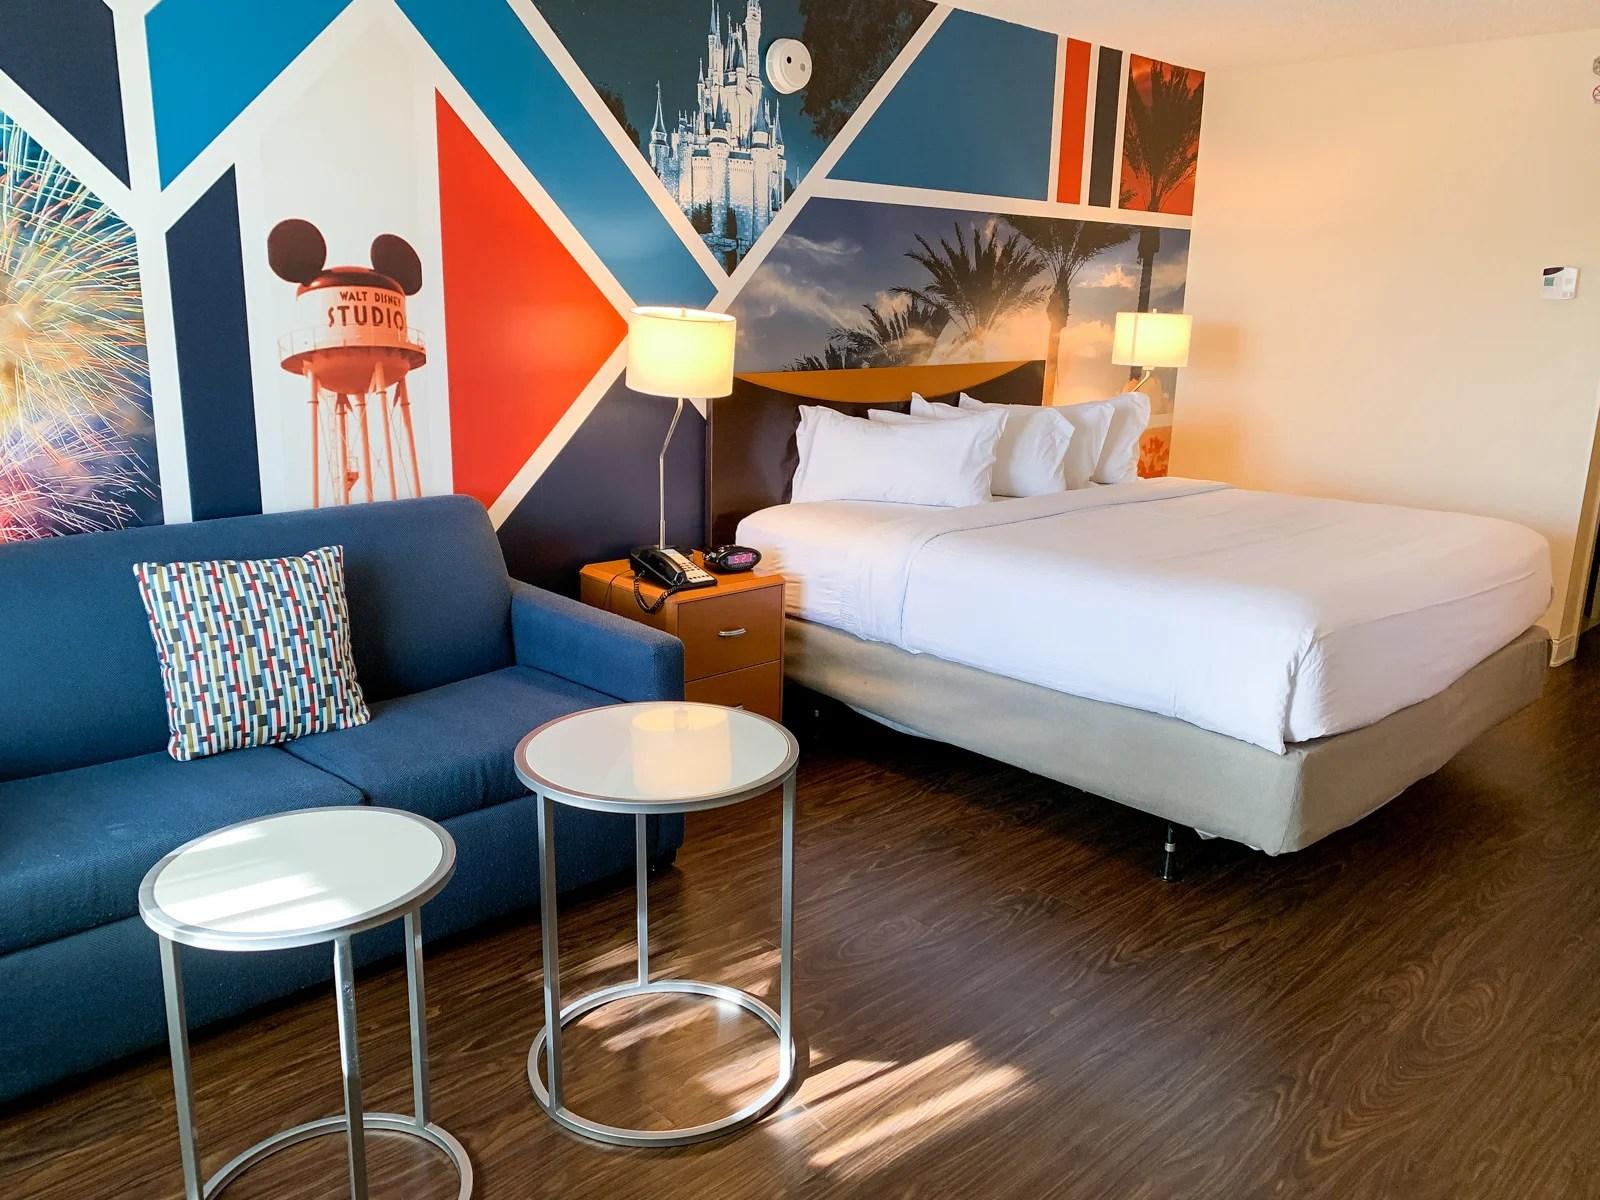 Disneyland's Affordable Neighbor: A Review of Fairfield Inn by Marriott Anaheim Resort